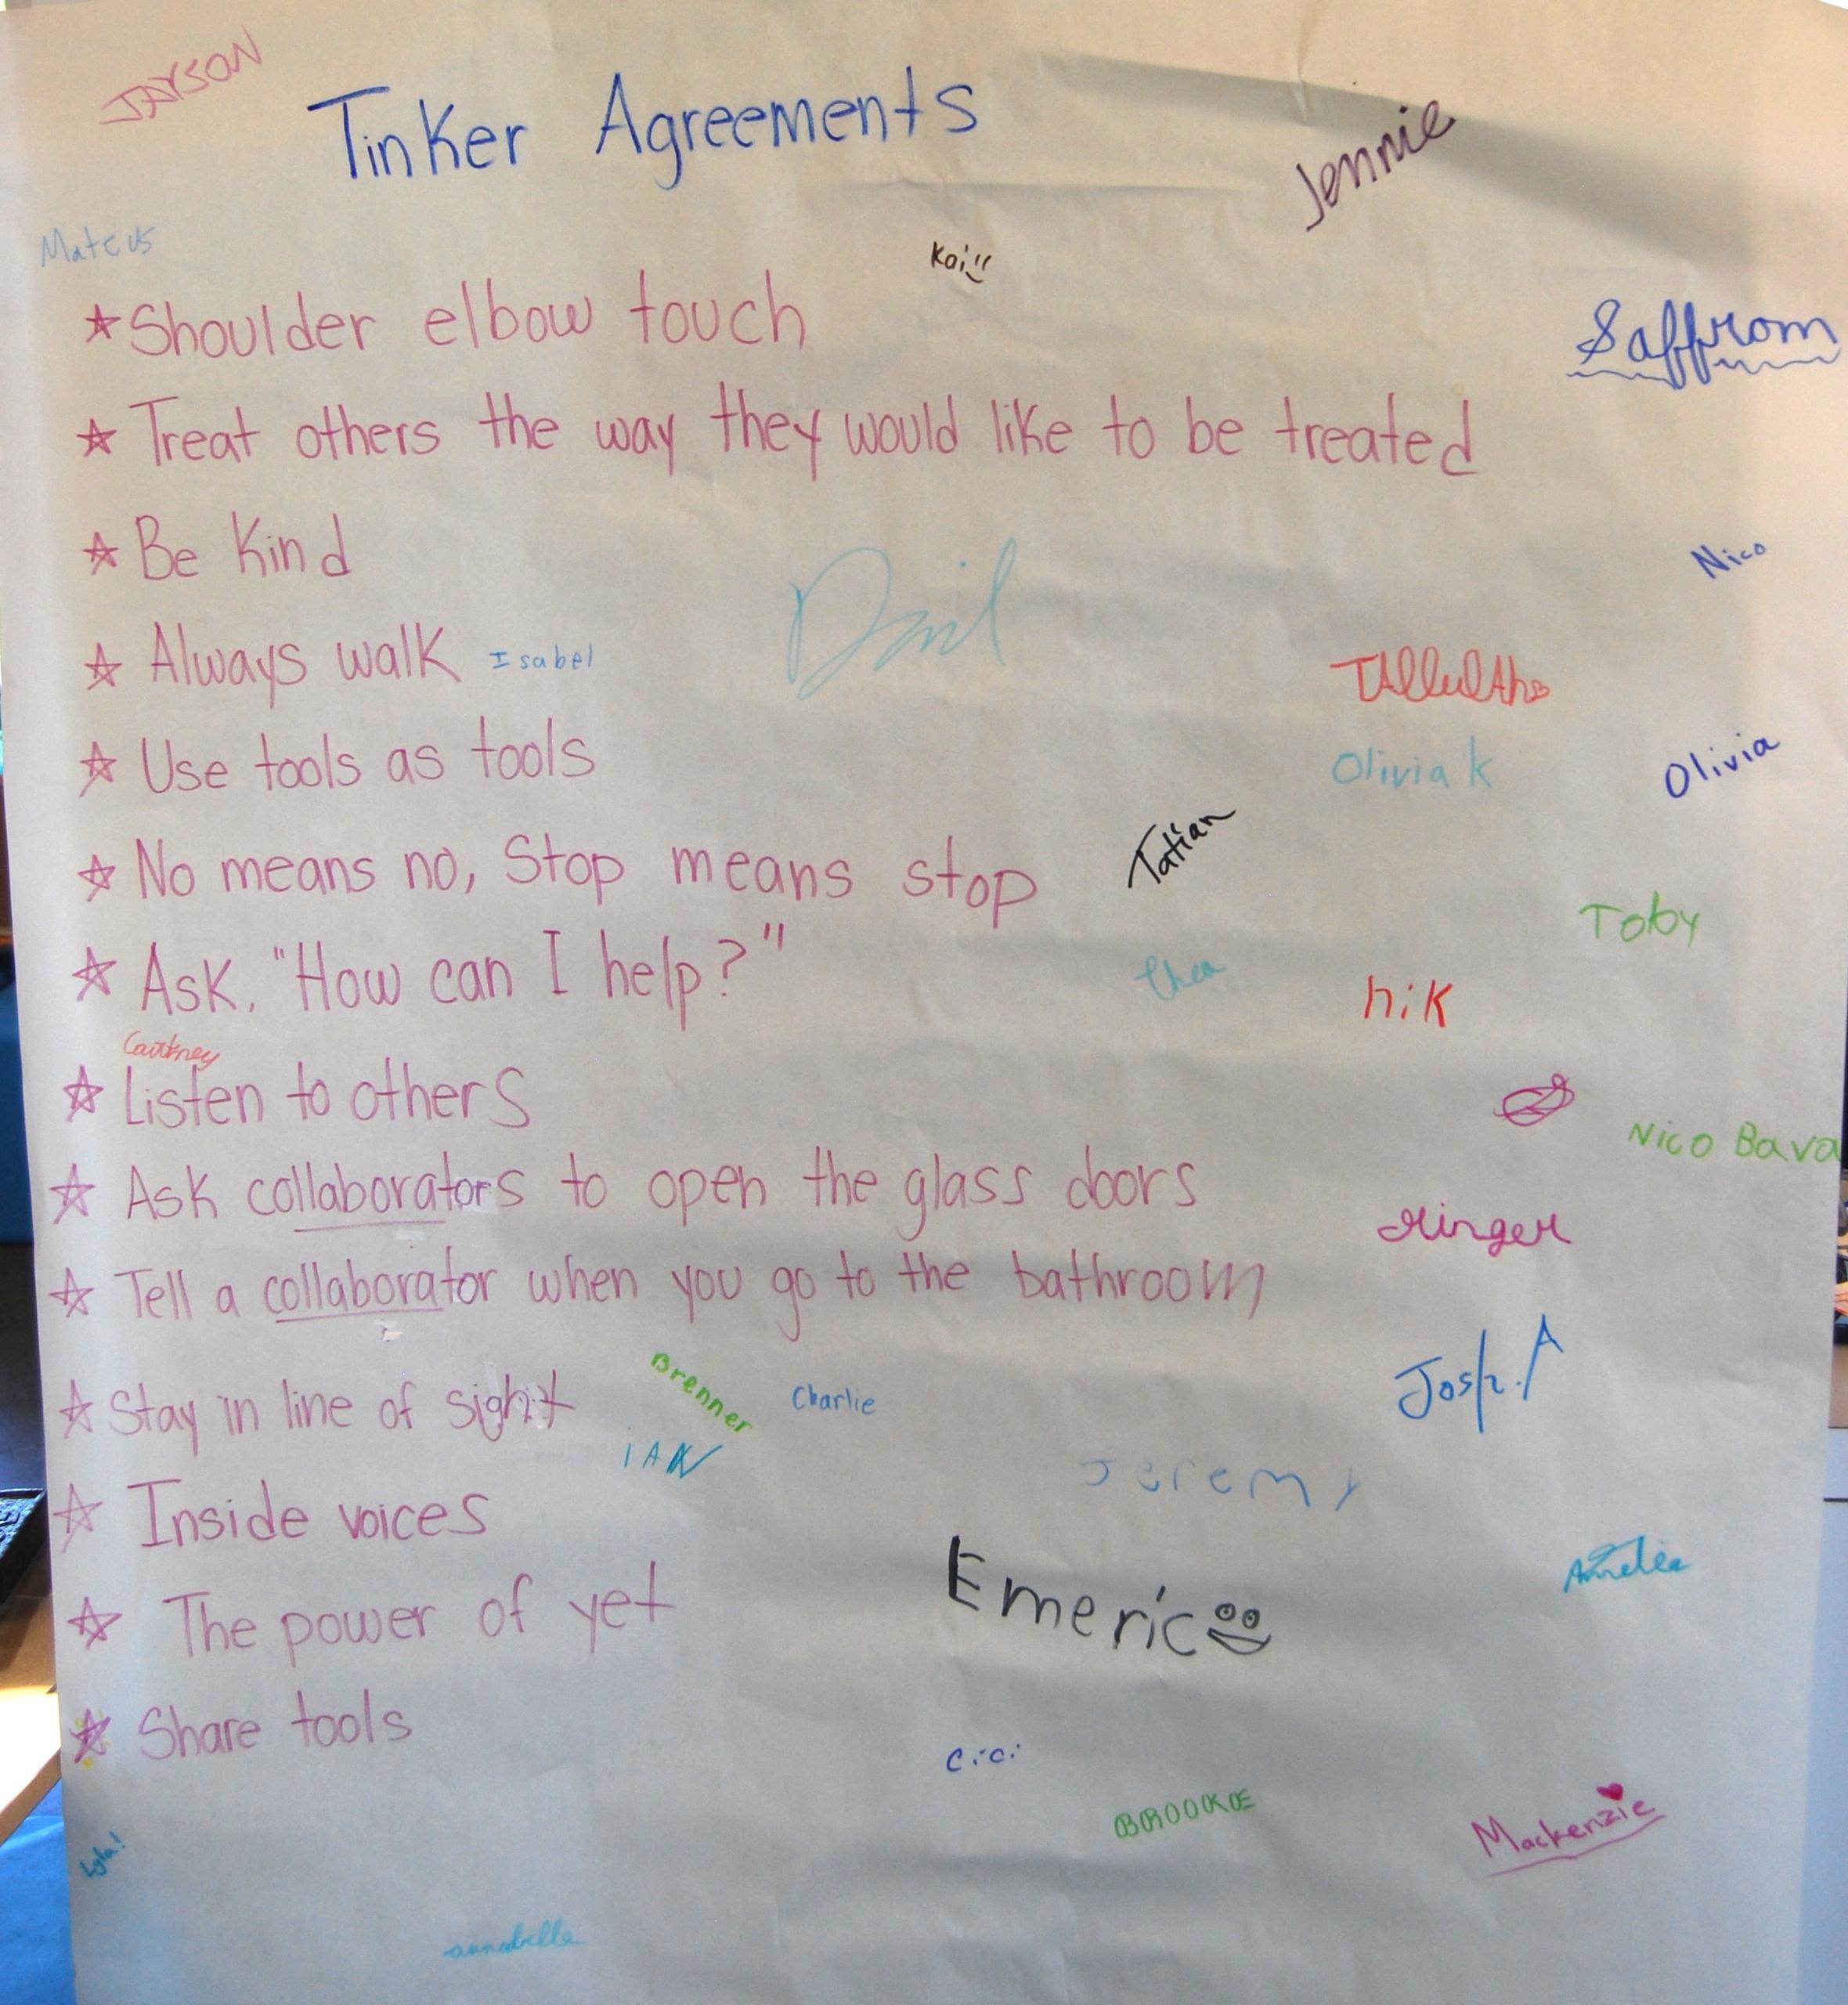 group agreements.JPG